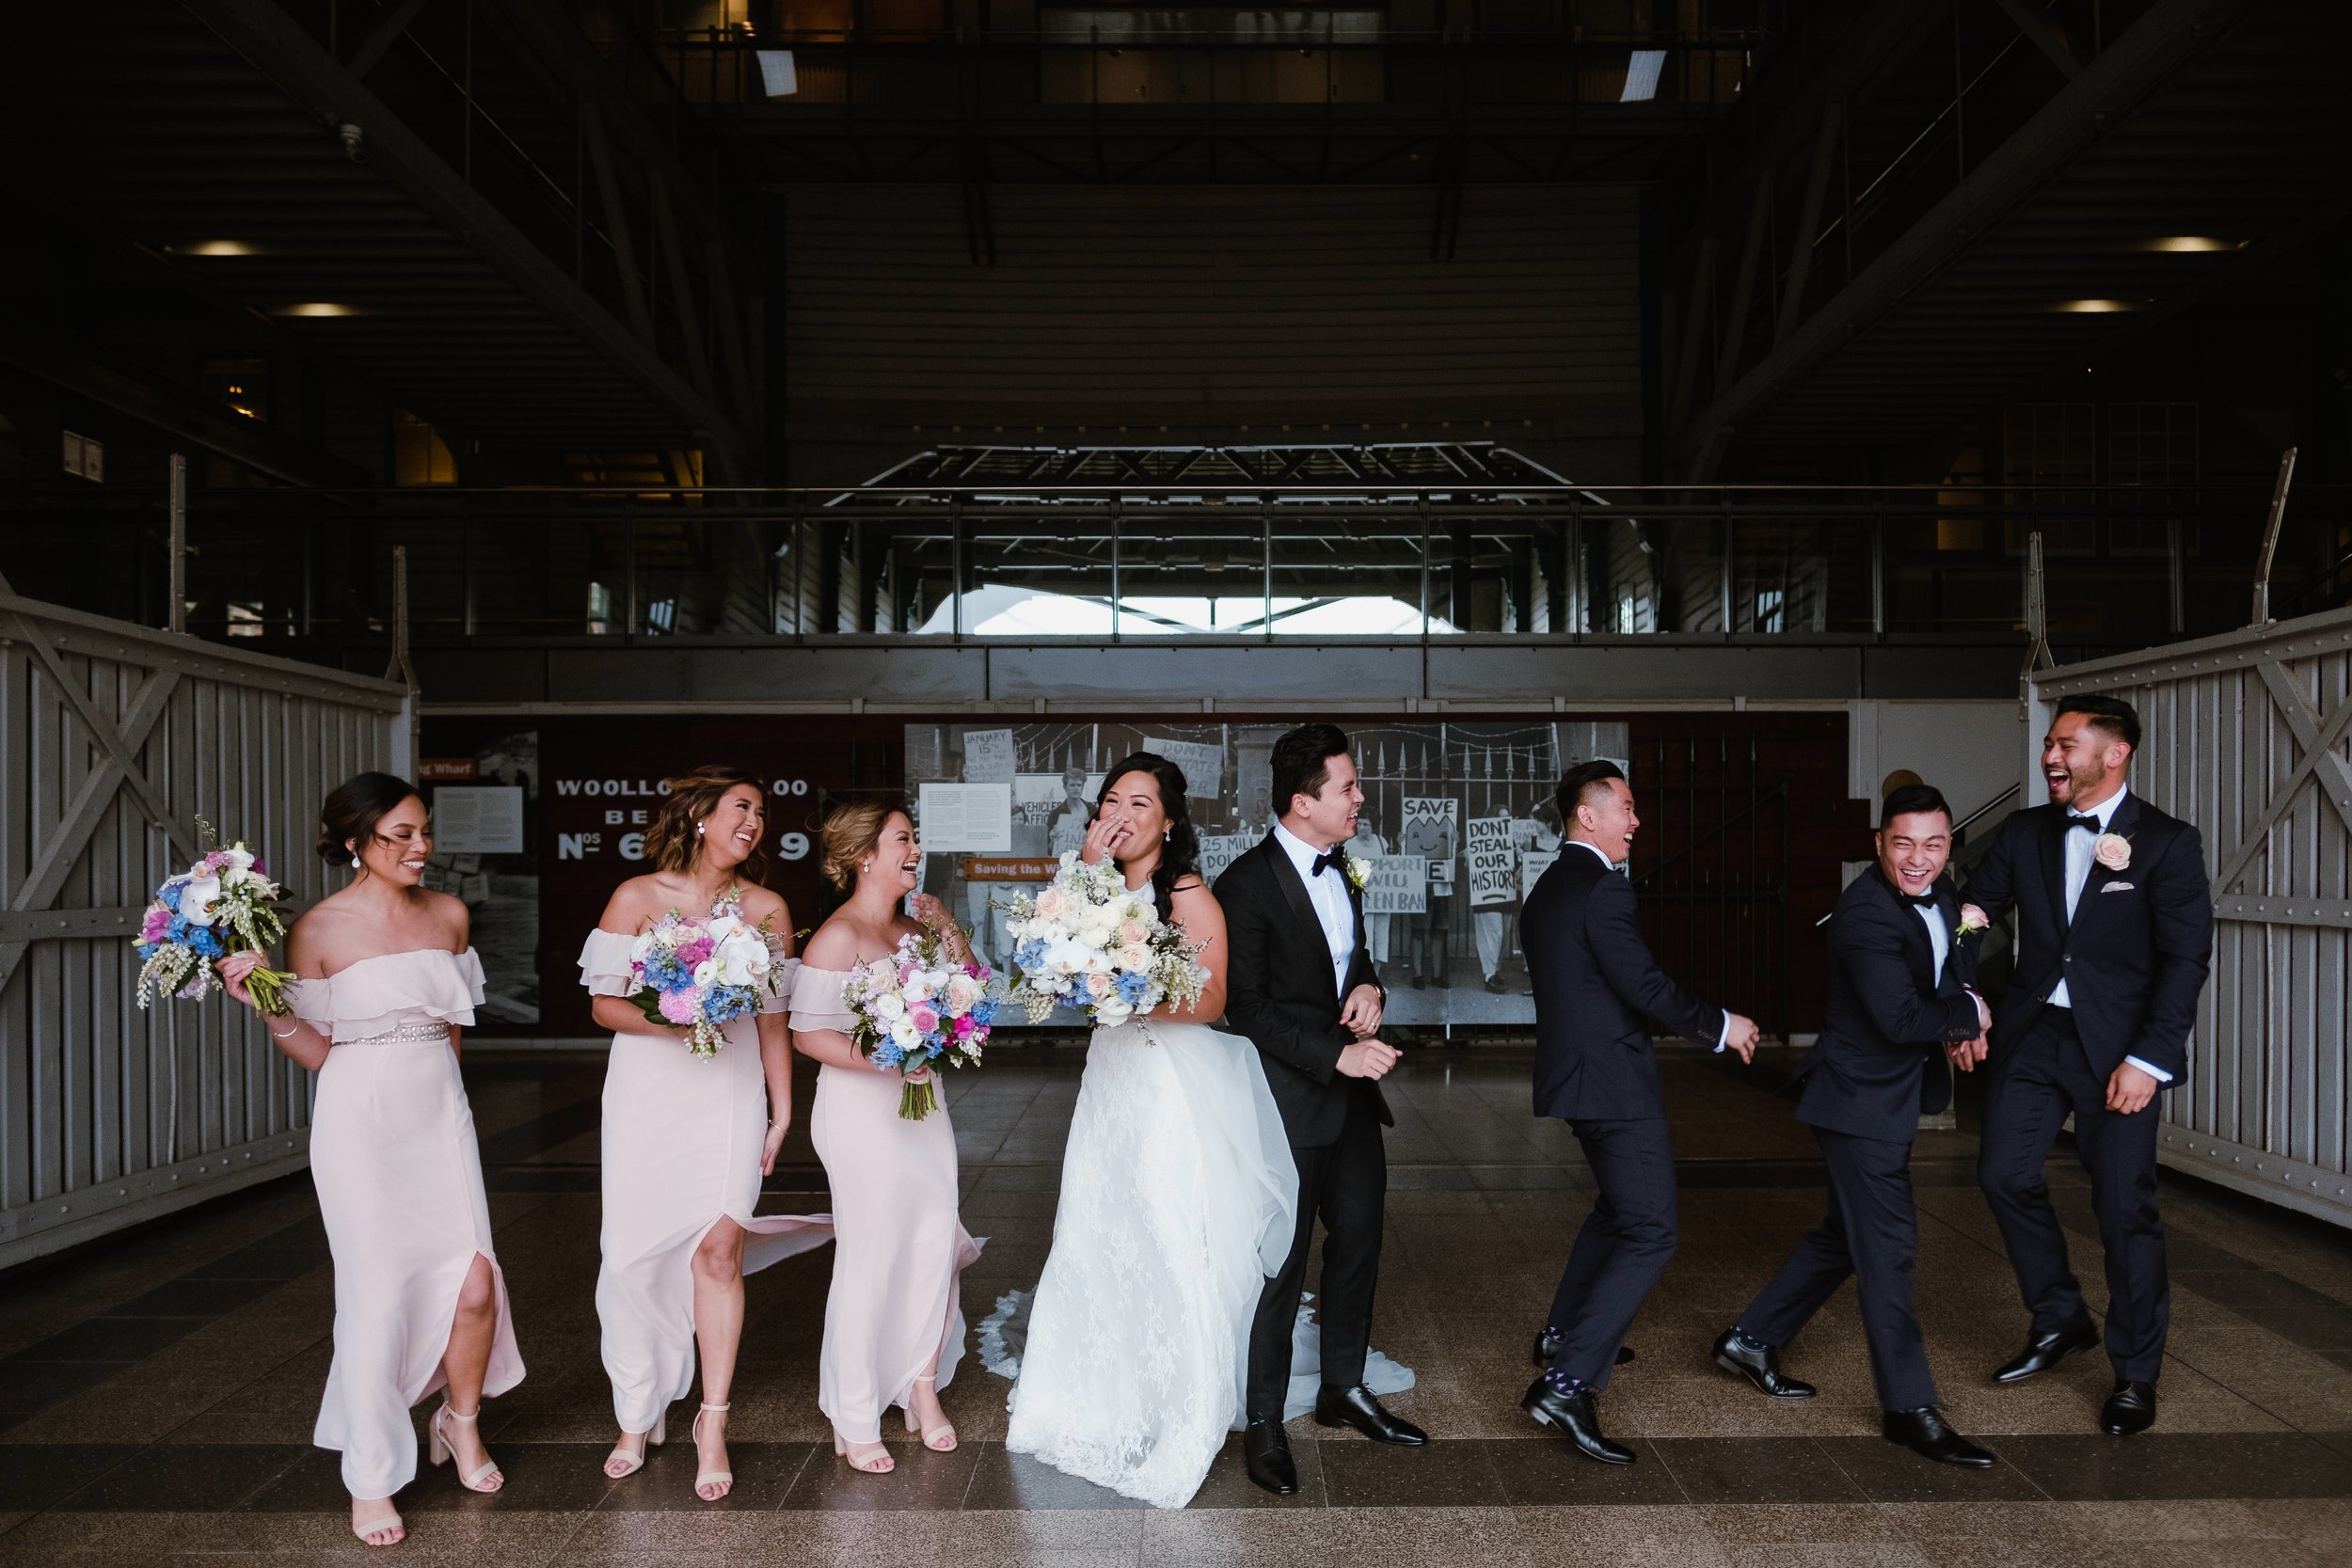 Maria and Gerald Sydney wedding by Milton Gan Photography 30.jpg